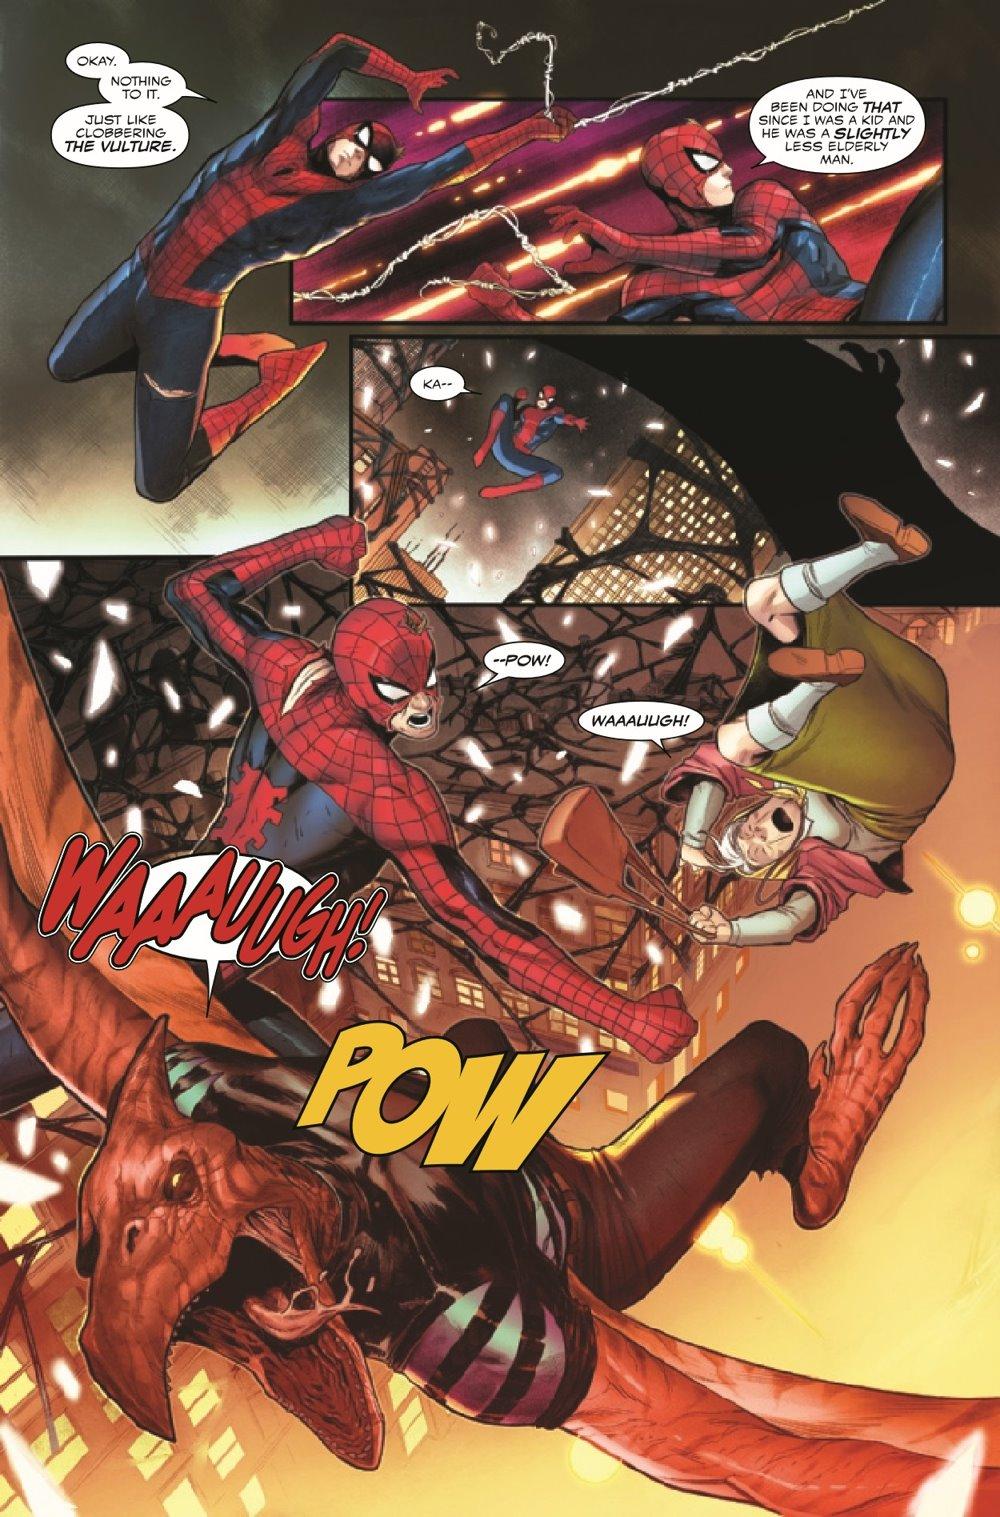 SMKIB2021001_Preview-6 ComicList Previews: KING IN BLACK SPIDER-MAN #1